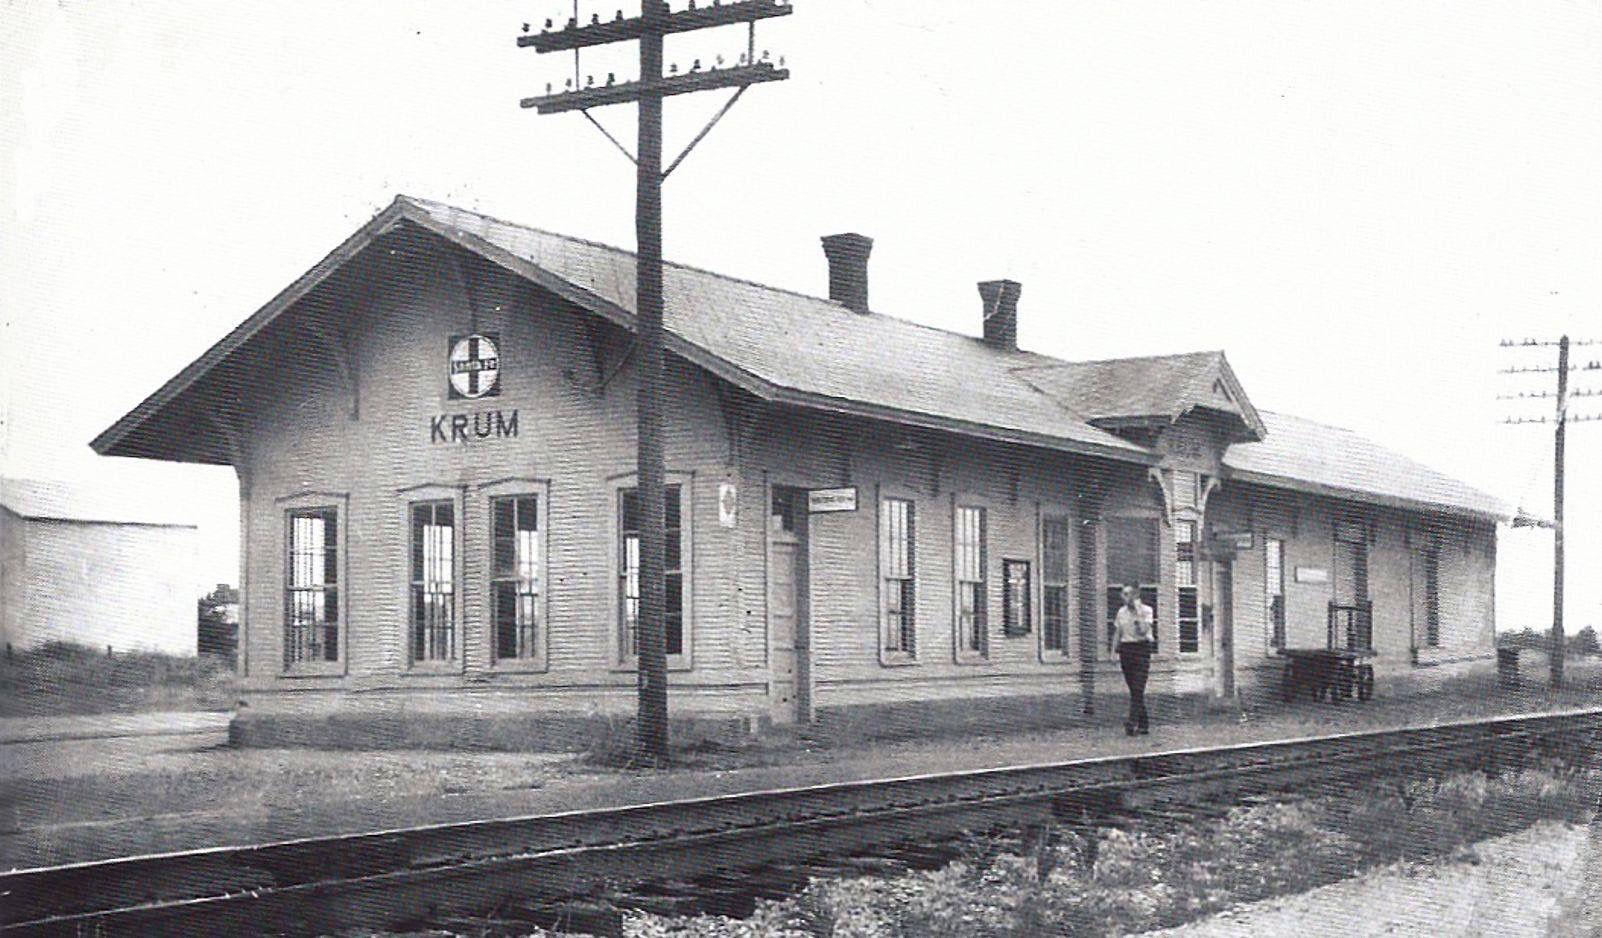 Pin by TJ on Santa Fe Railroad Railroad station, Train